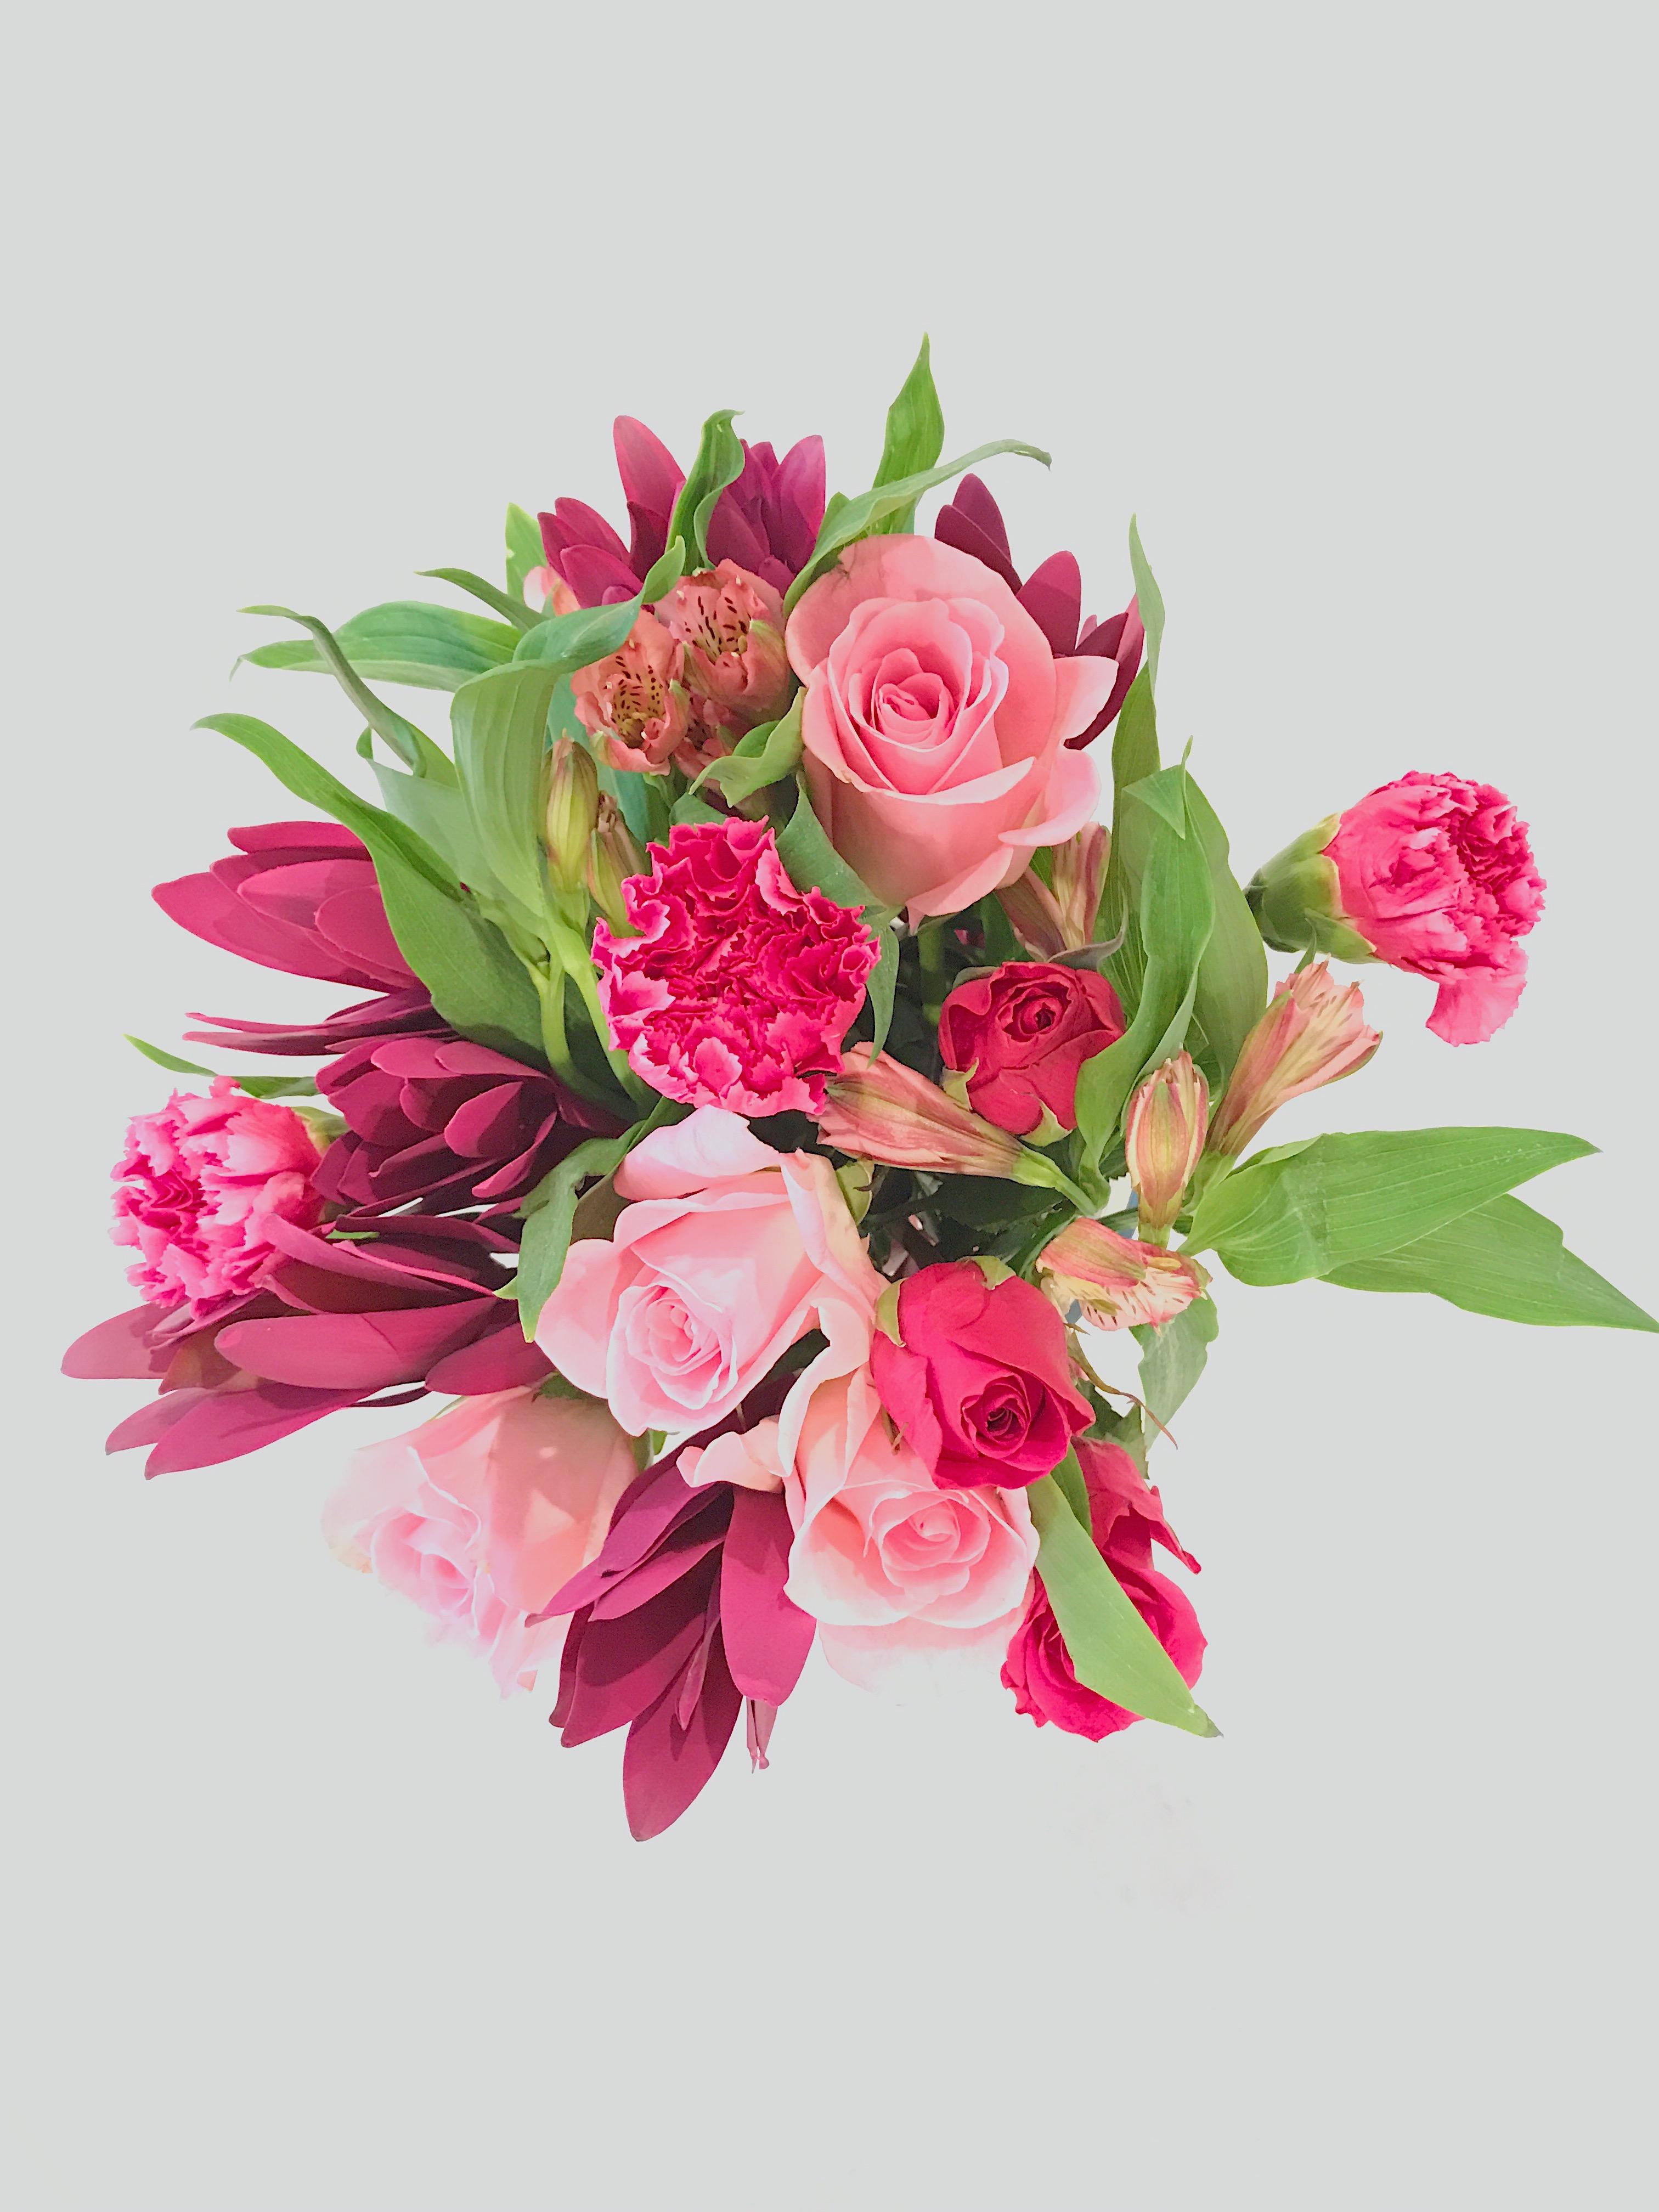 valentines-flowers-birthday-flowers-1111lightlane